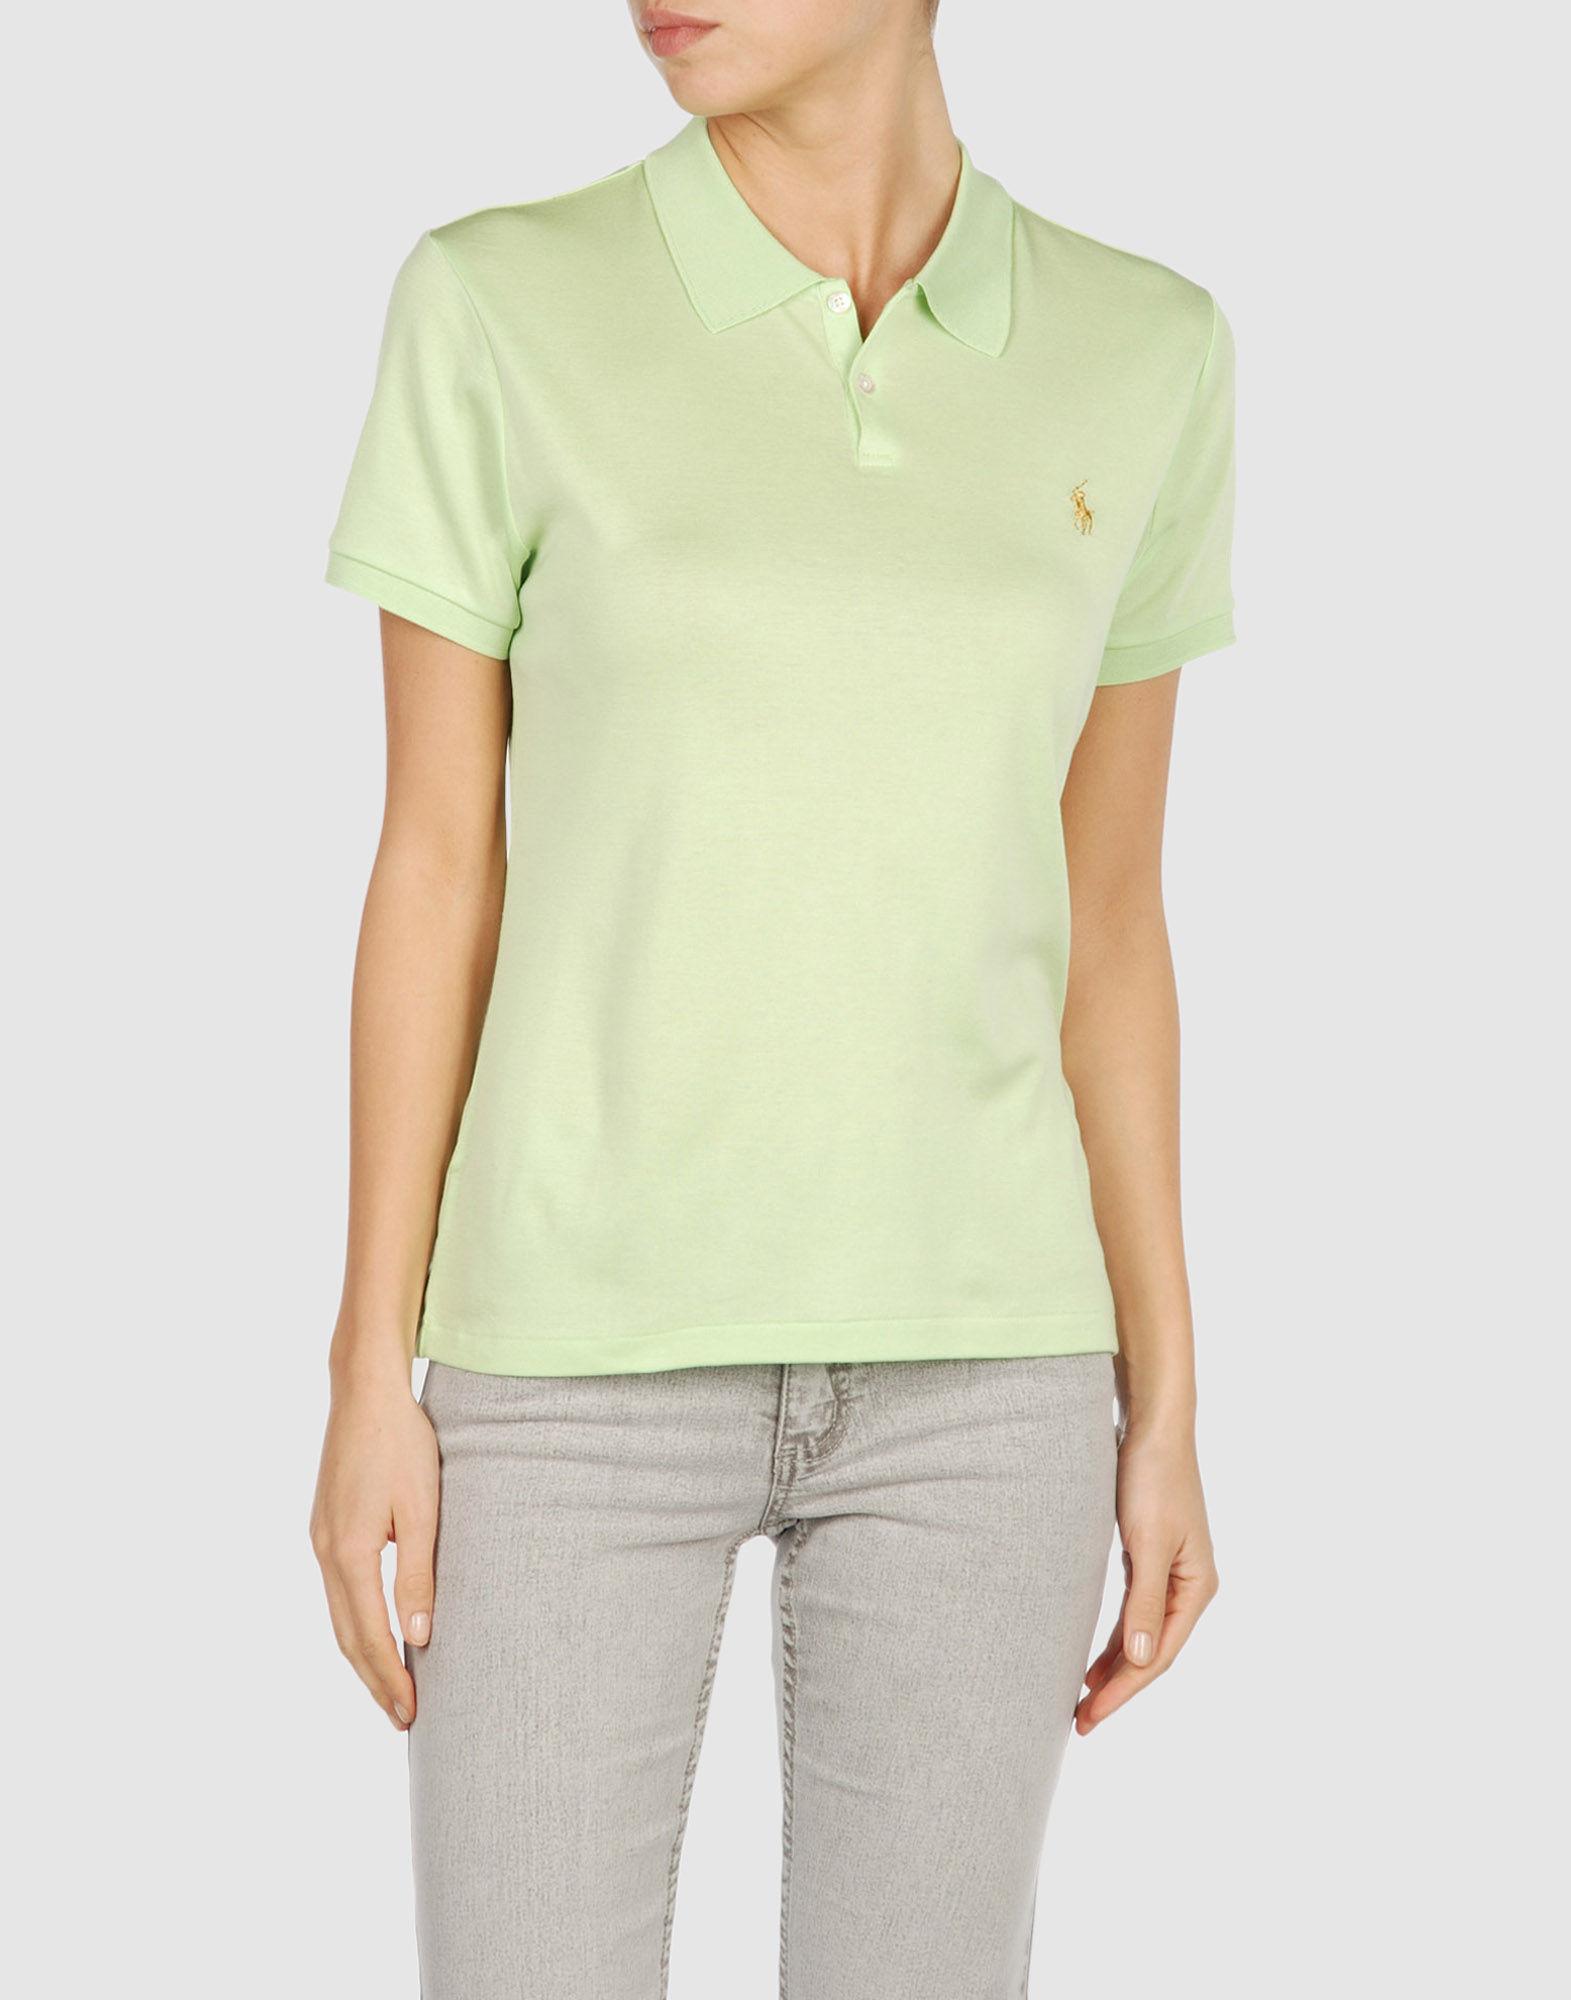 Ralph lauren black label polo shirt in green lyst for Ralph lauren black label polo shirt